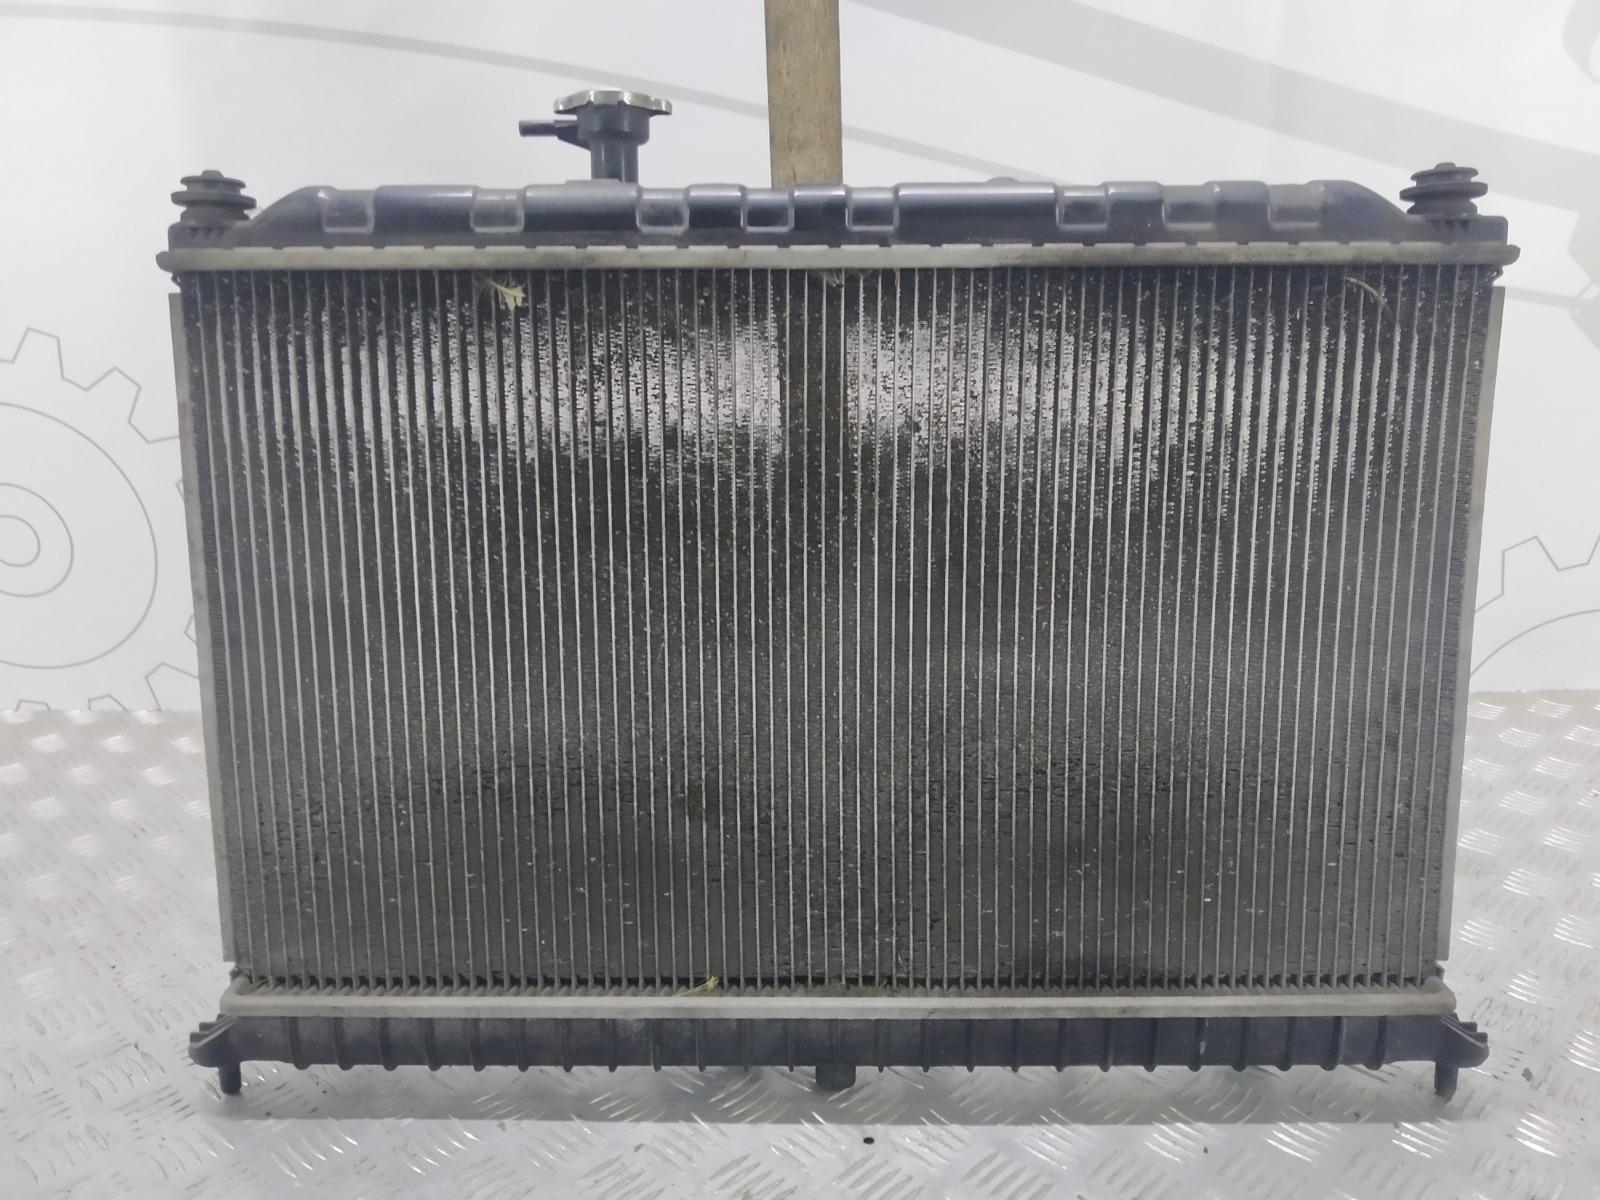 Радиатор (основной) Kia Rio 1.4 I 2006 (б/у)